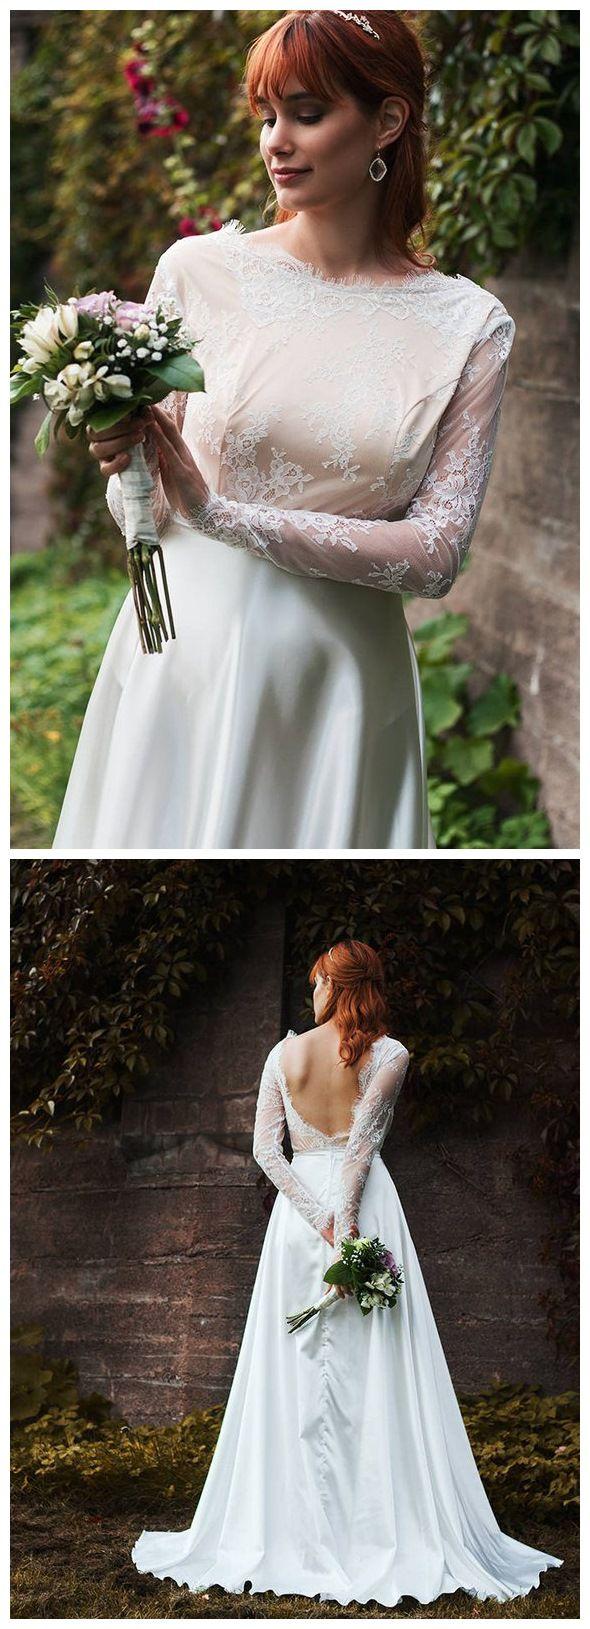 Long sleeve modest white wedding dresses satin plus size beach